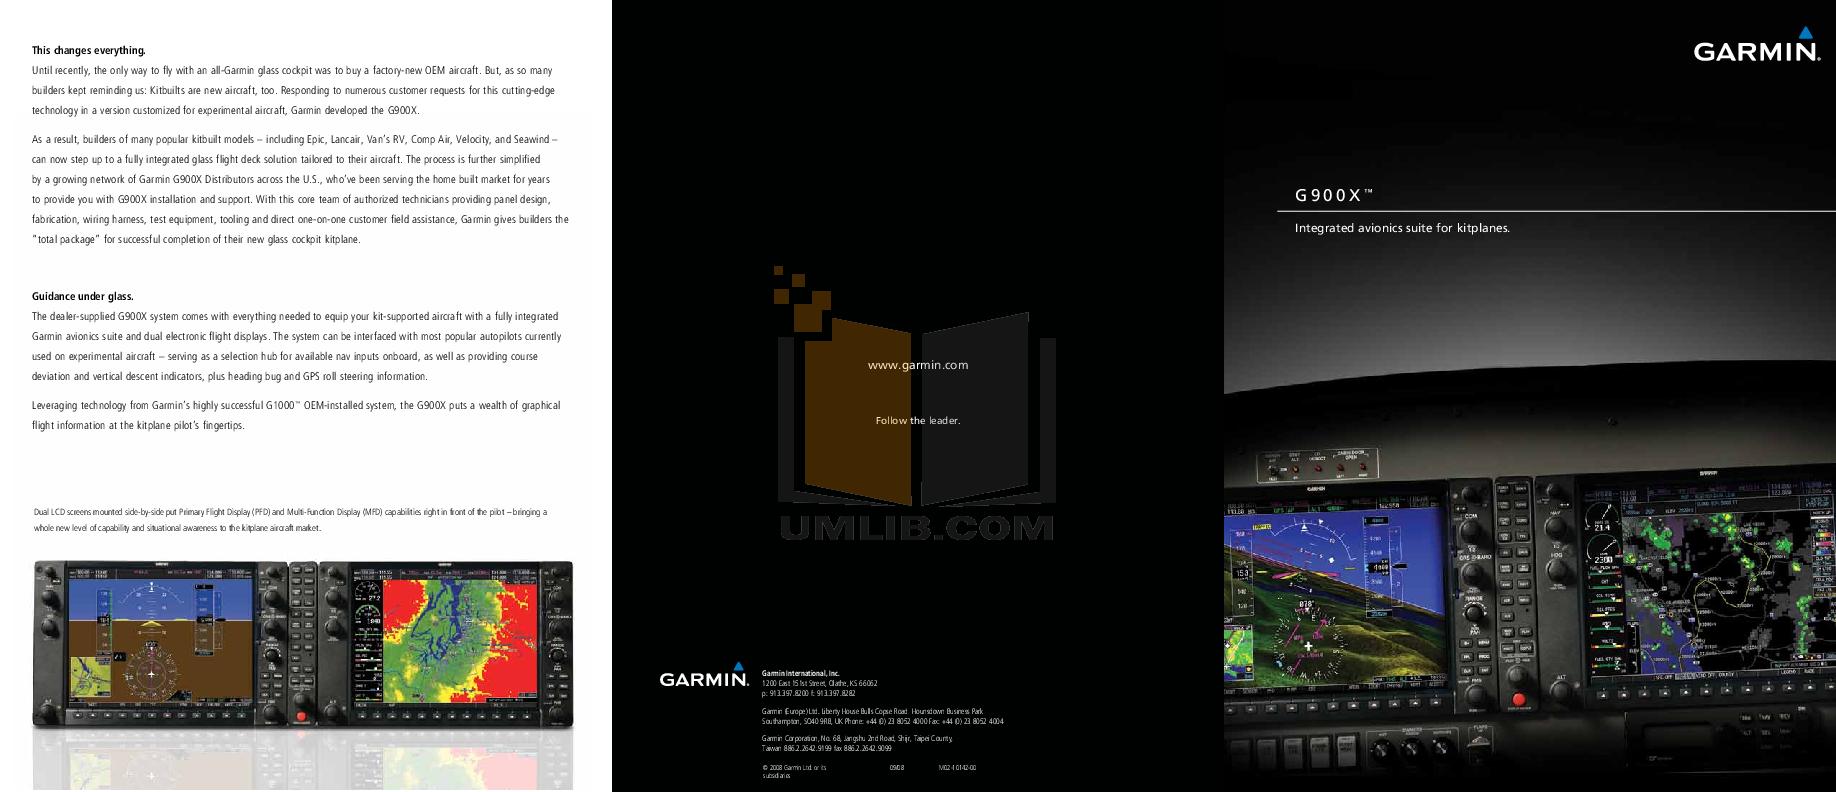 Download Free Pdf For Garmin G900x Gps Manual Wiring Harness